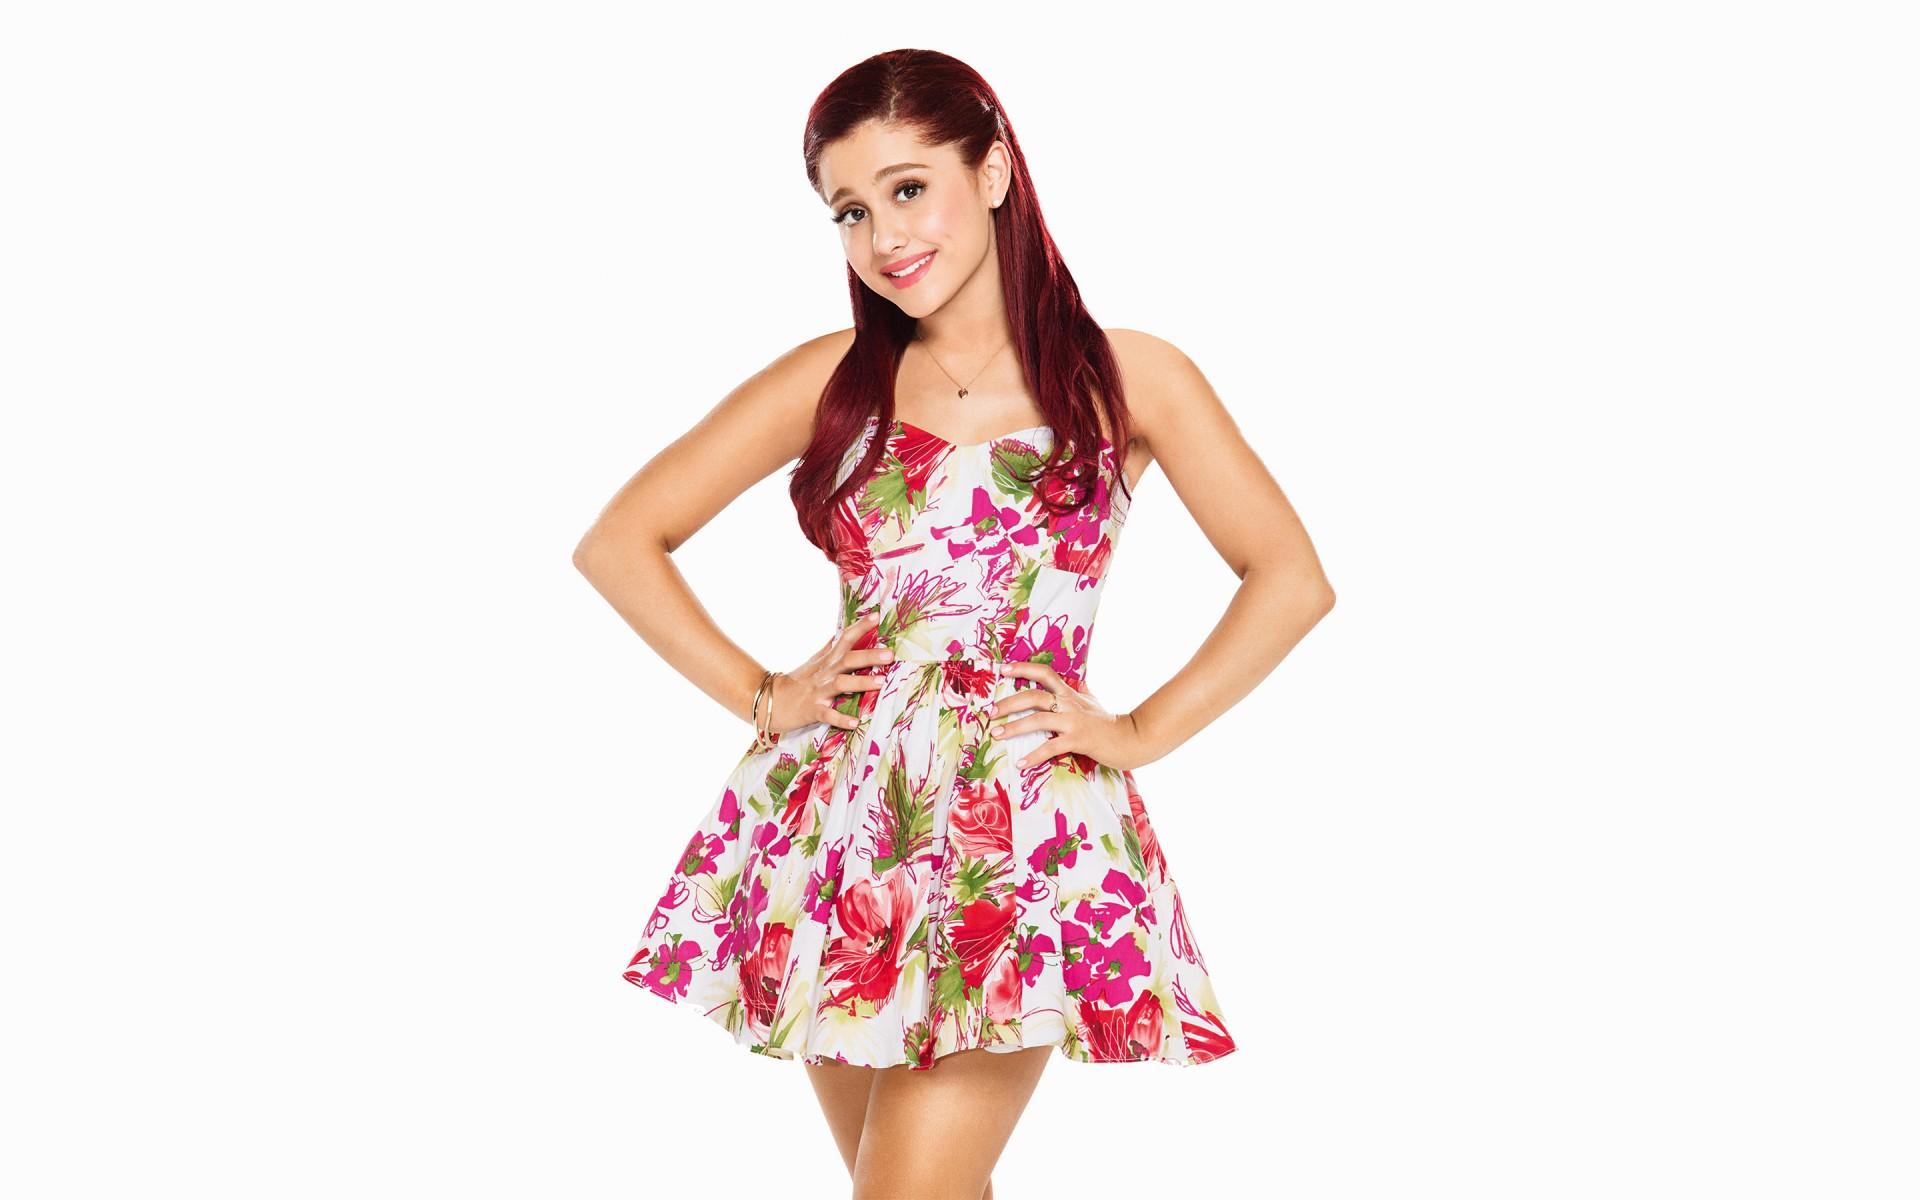 Star Wallpaper Cute Kawaii Ariana Grande 2016 Wallpapers Hd Wallpapers Id 16587